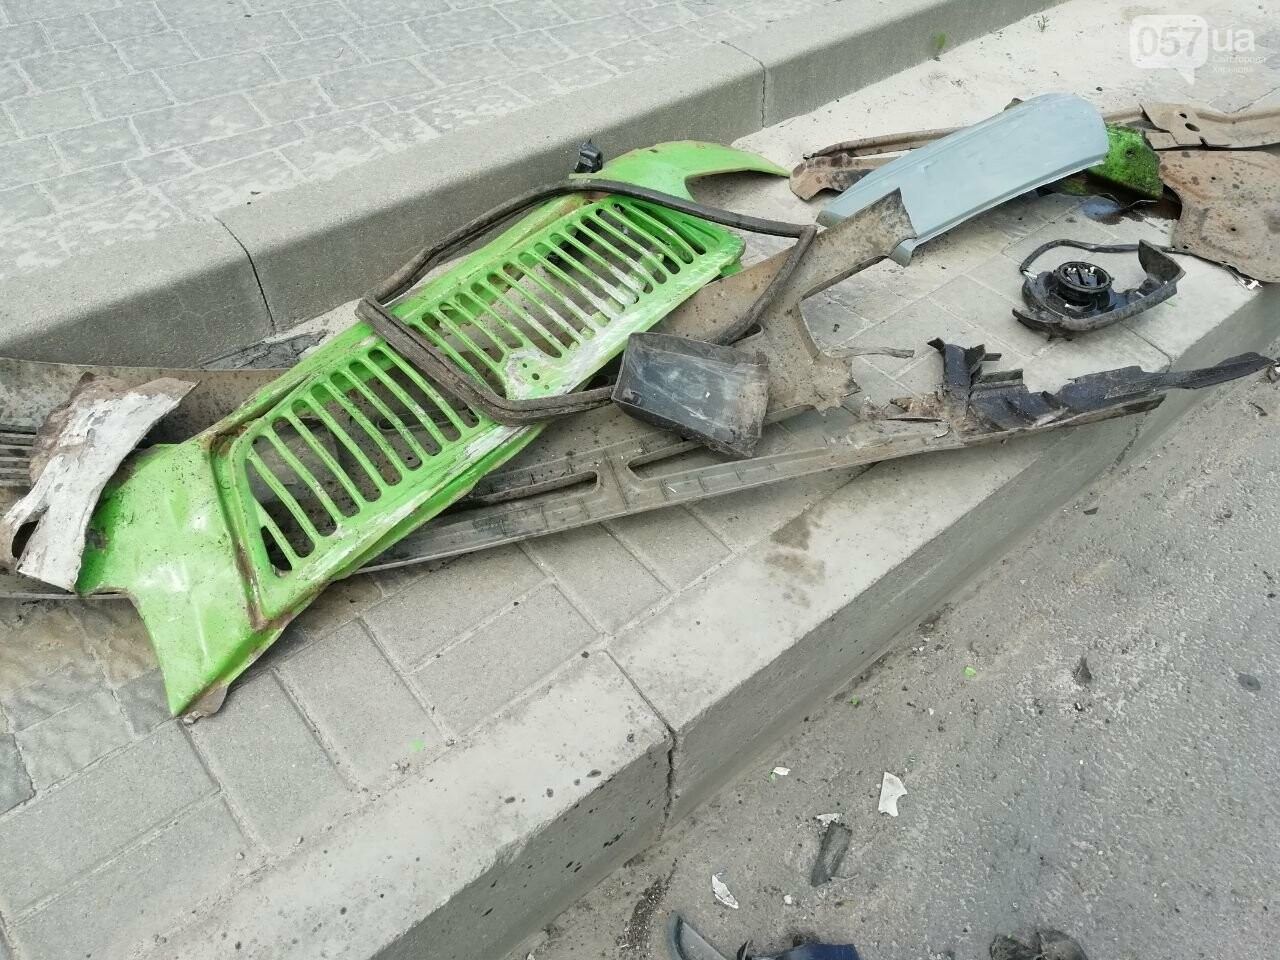 «Все сидели в крови»: подробности аварии на проспекте Тракторостроителей, - ФОТО, ВИДЕО, фото-9